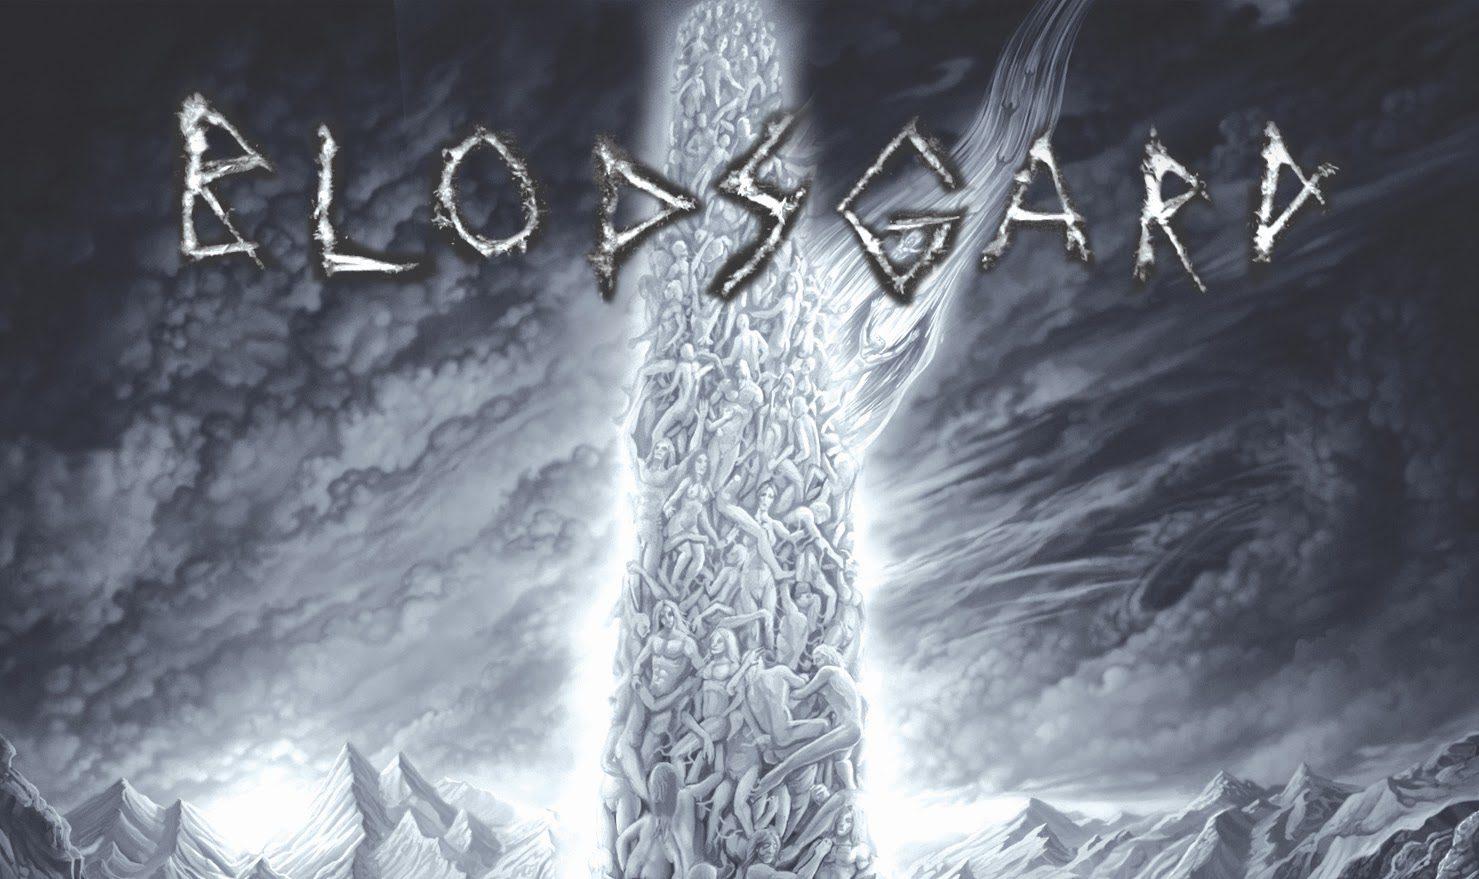 BLODSGARD – Monument